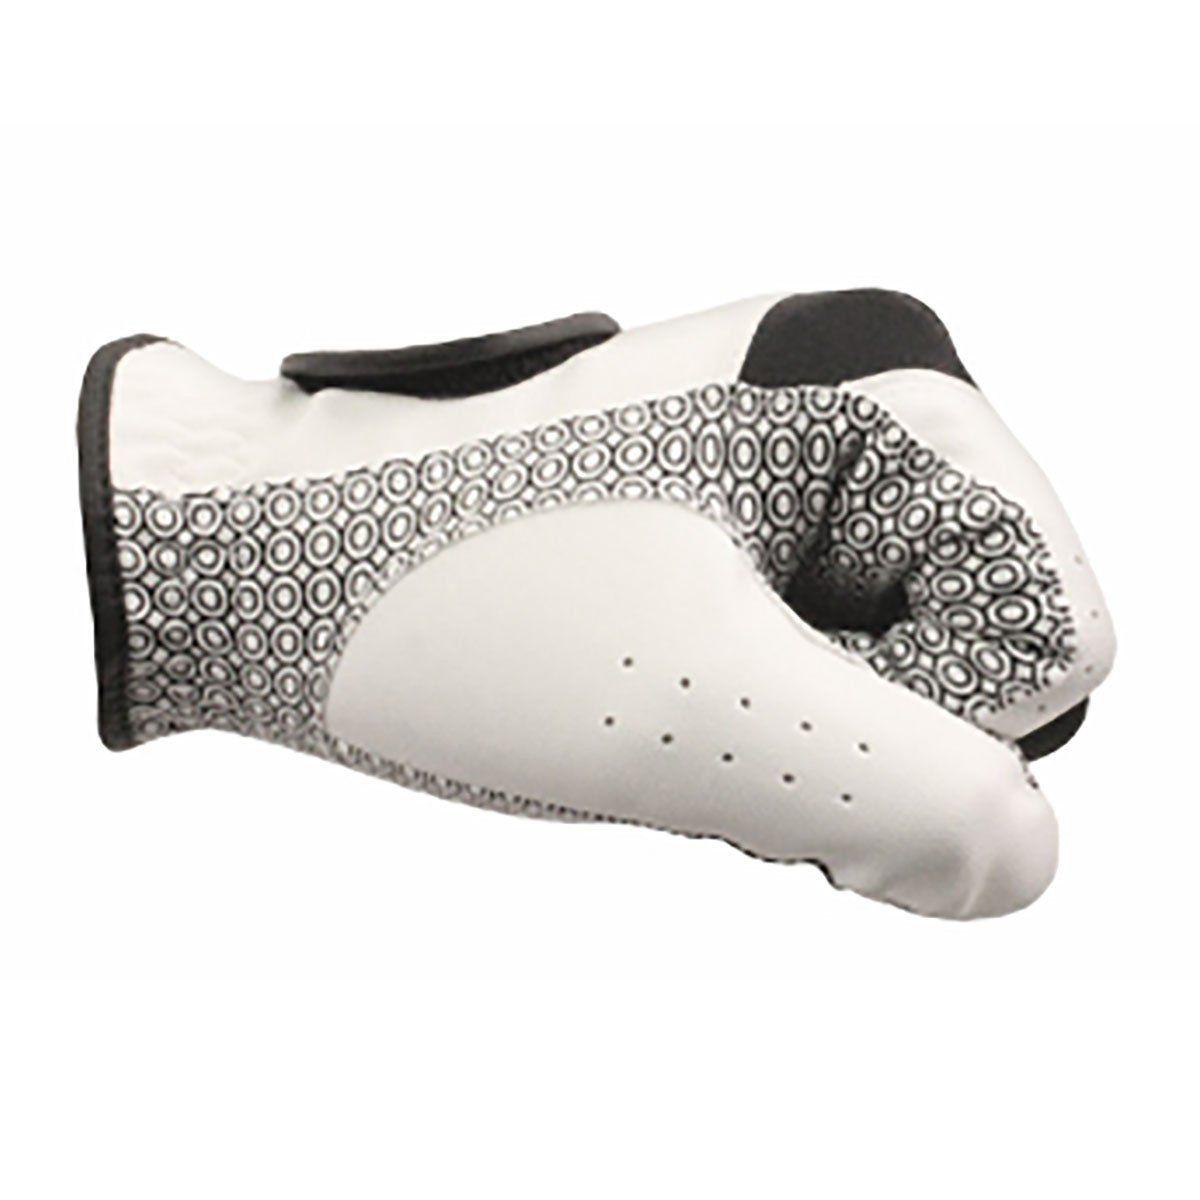 Golf glove 5 pack kpga official product mens white